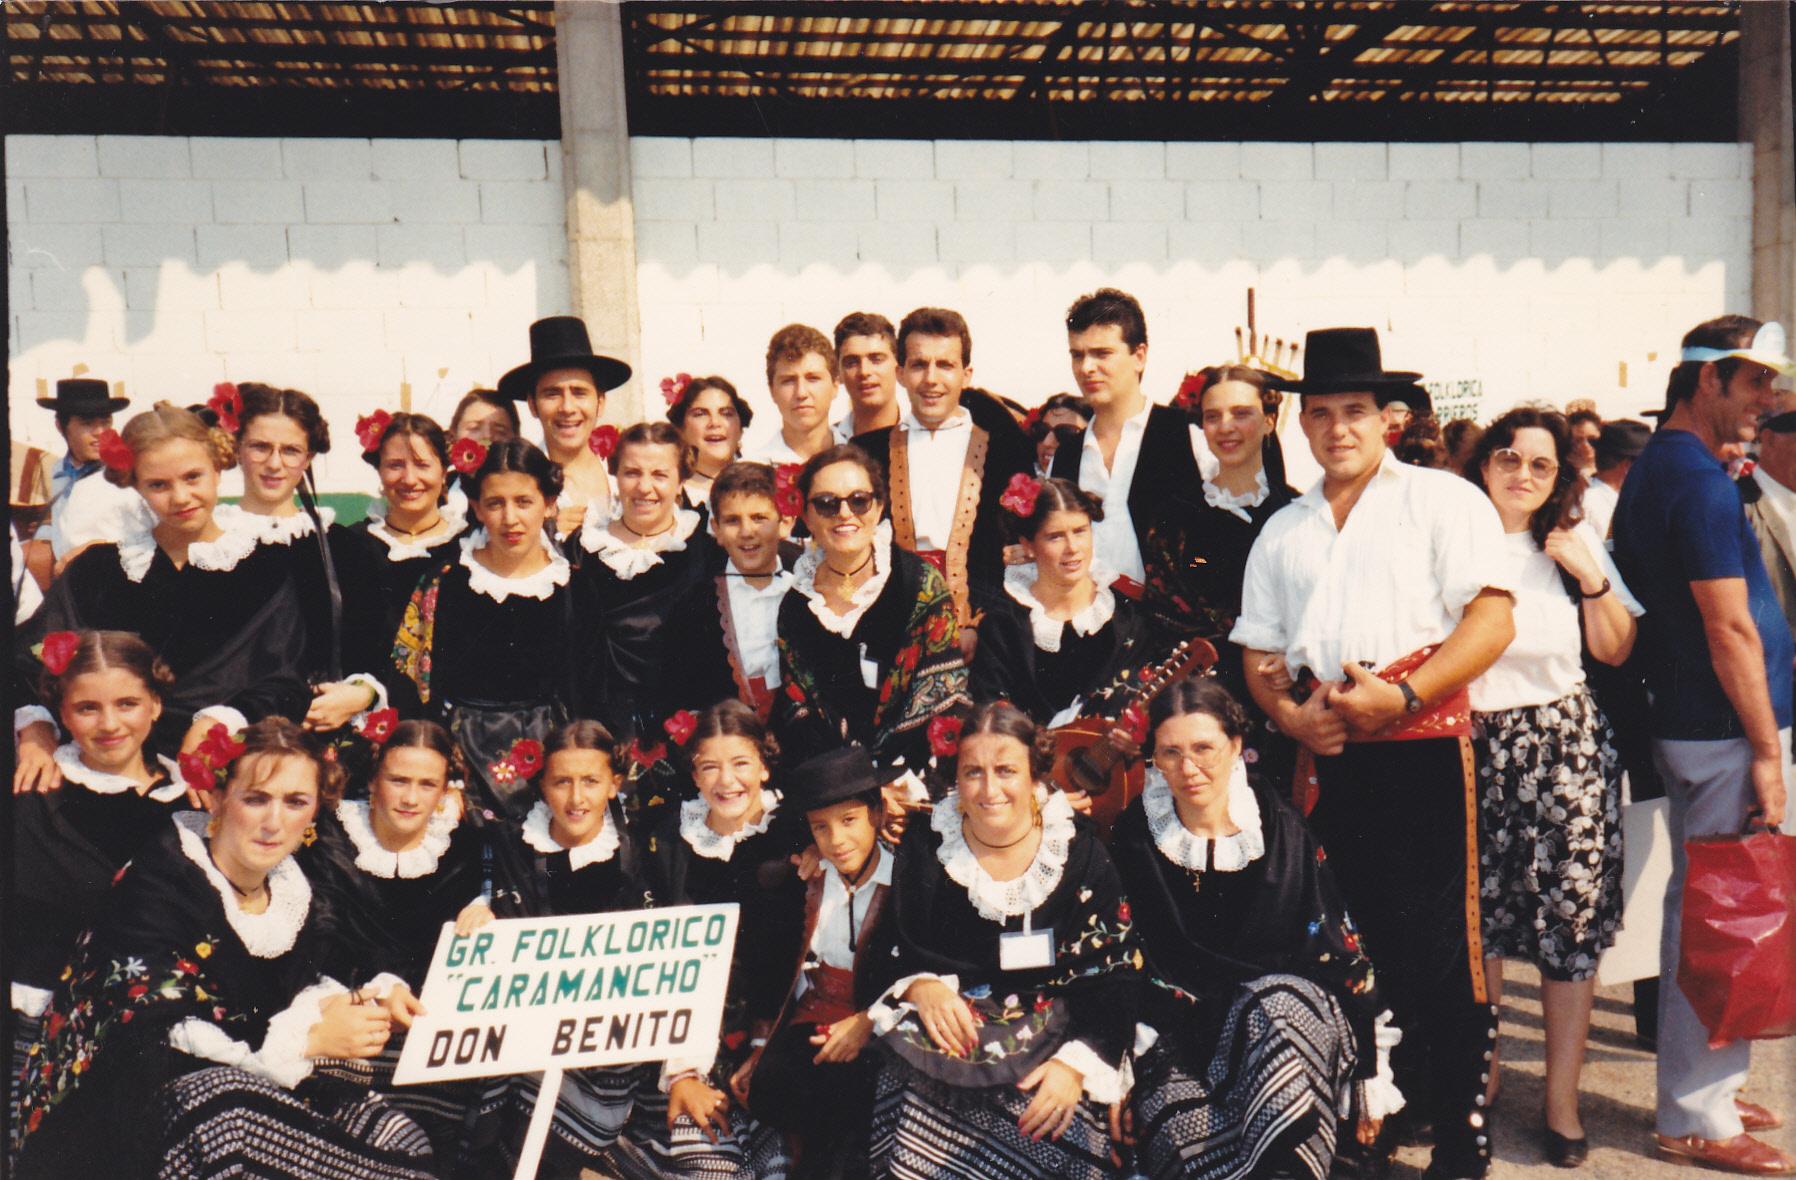 1989 - Trujillo (Dia de Extremadura, 8 de Septiembre) 01